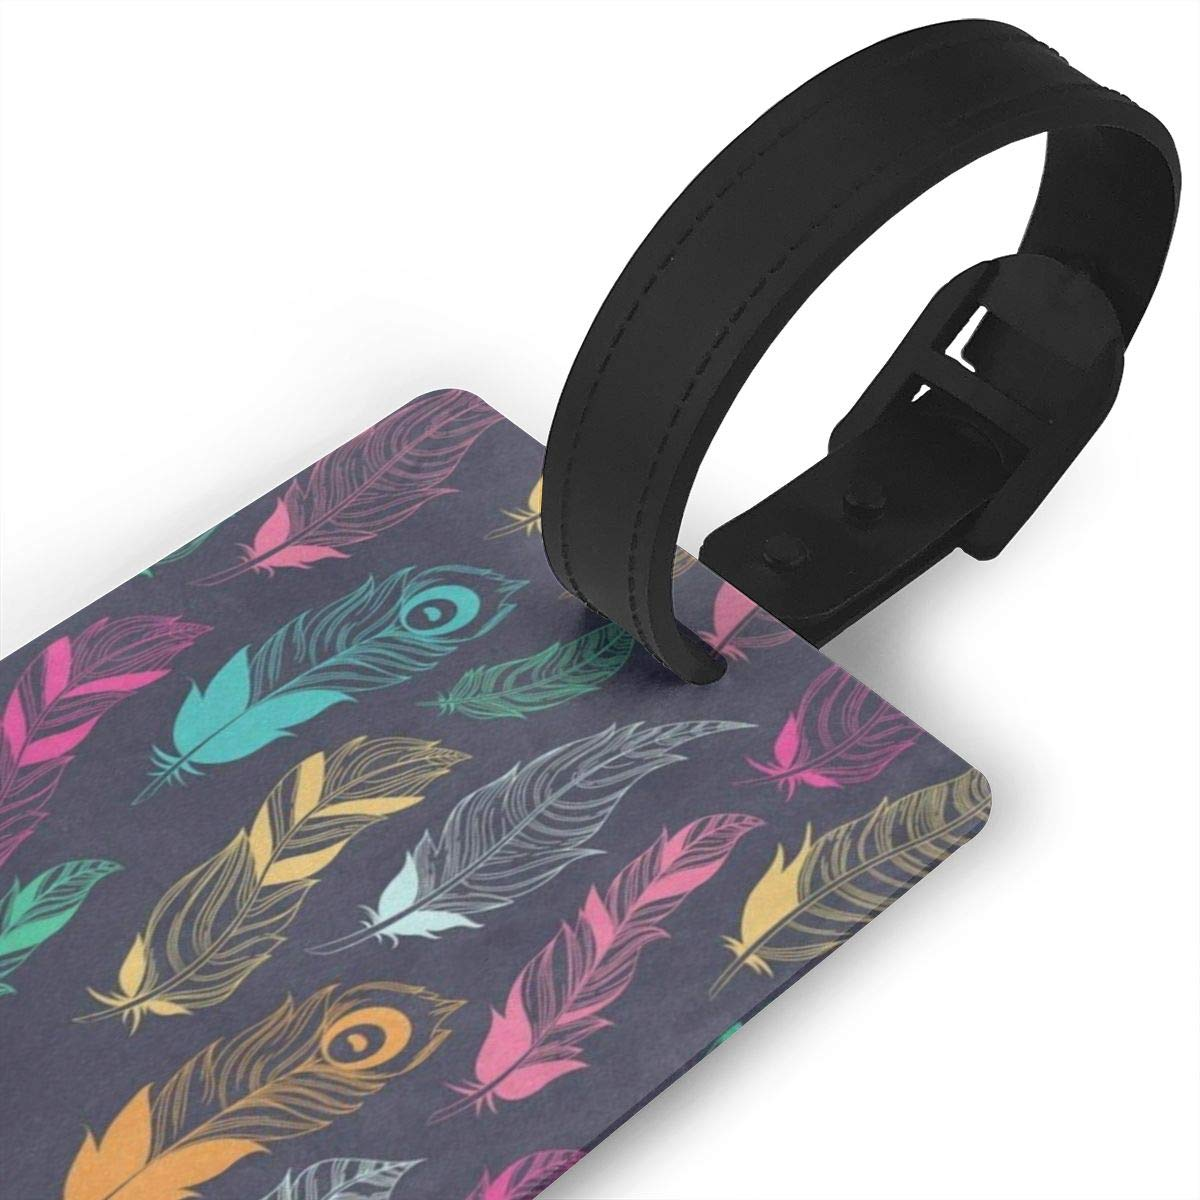 Luggage Tags Colorful Paw Print Bag Tag for Travel 2 PCS